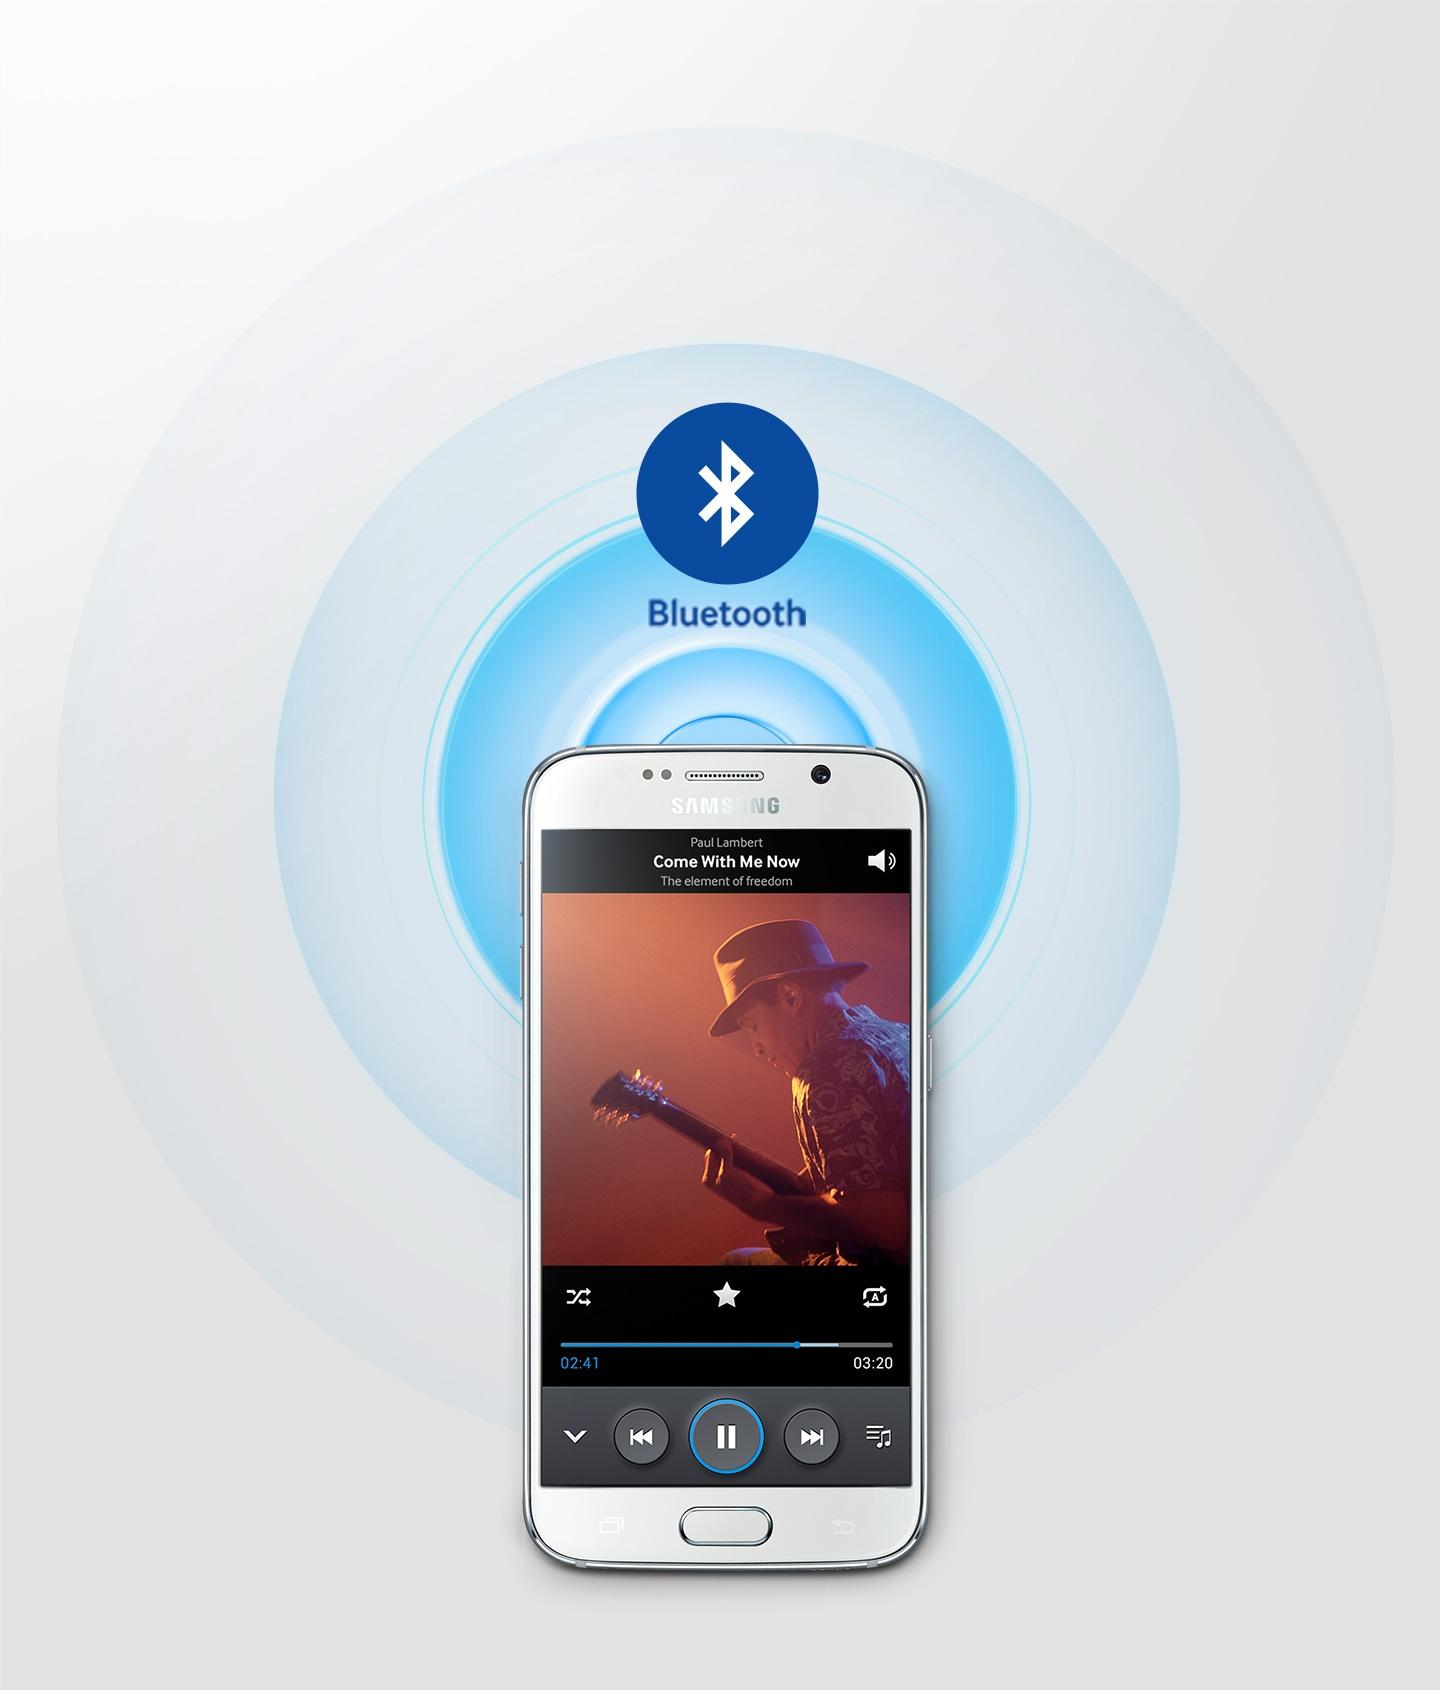 Music streaming service via Bluetooth